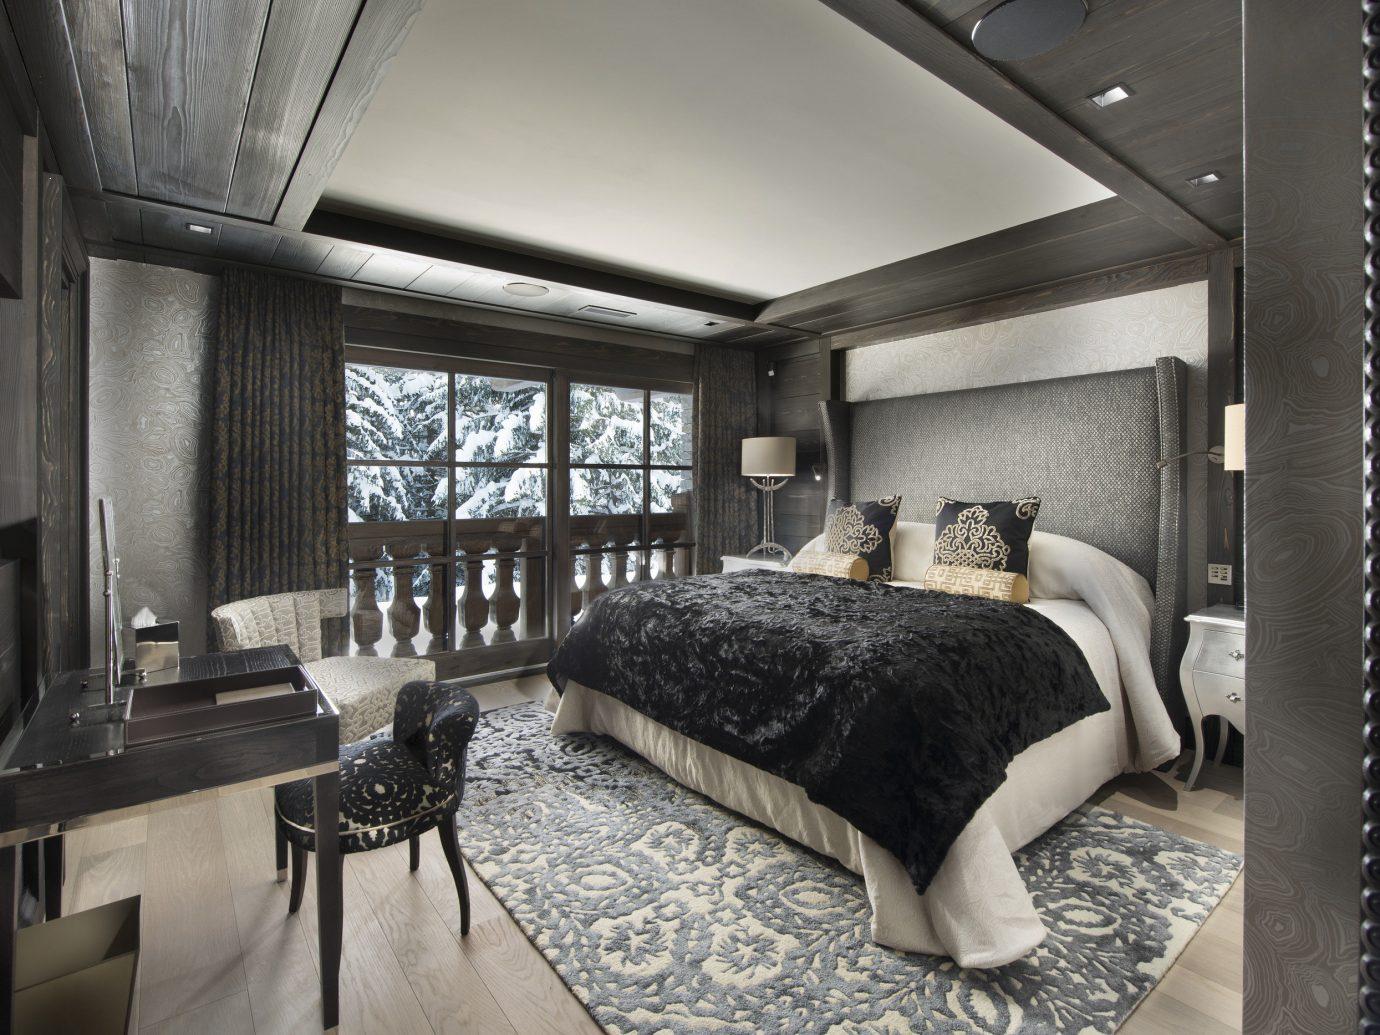 Hotels Luxury Travel Mountains + Skiing indoor room property window bed living room home interior design estate Design loft cottage Bedroom furniture